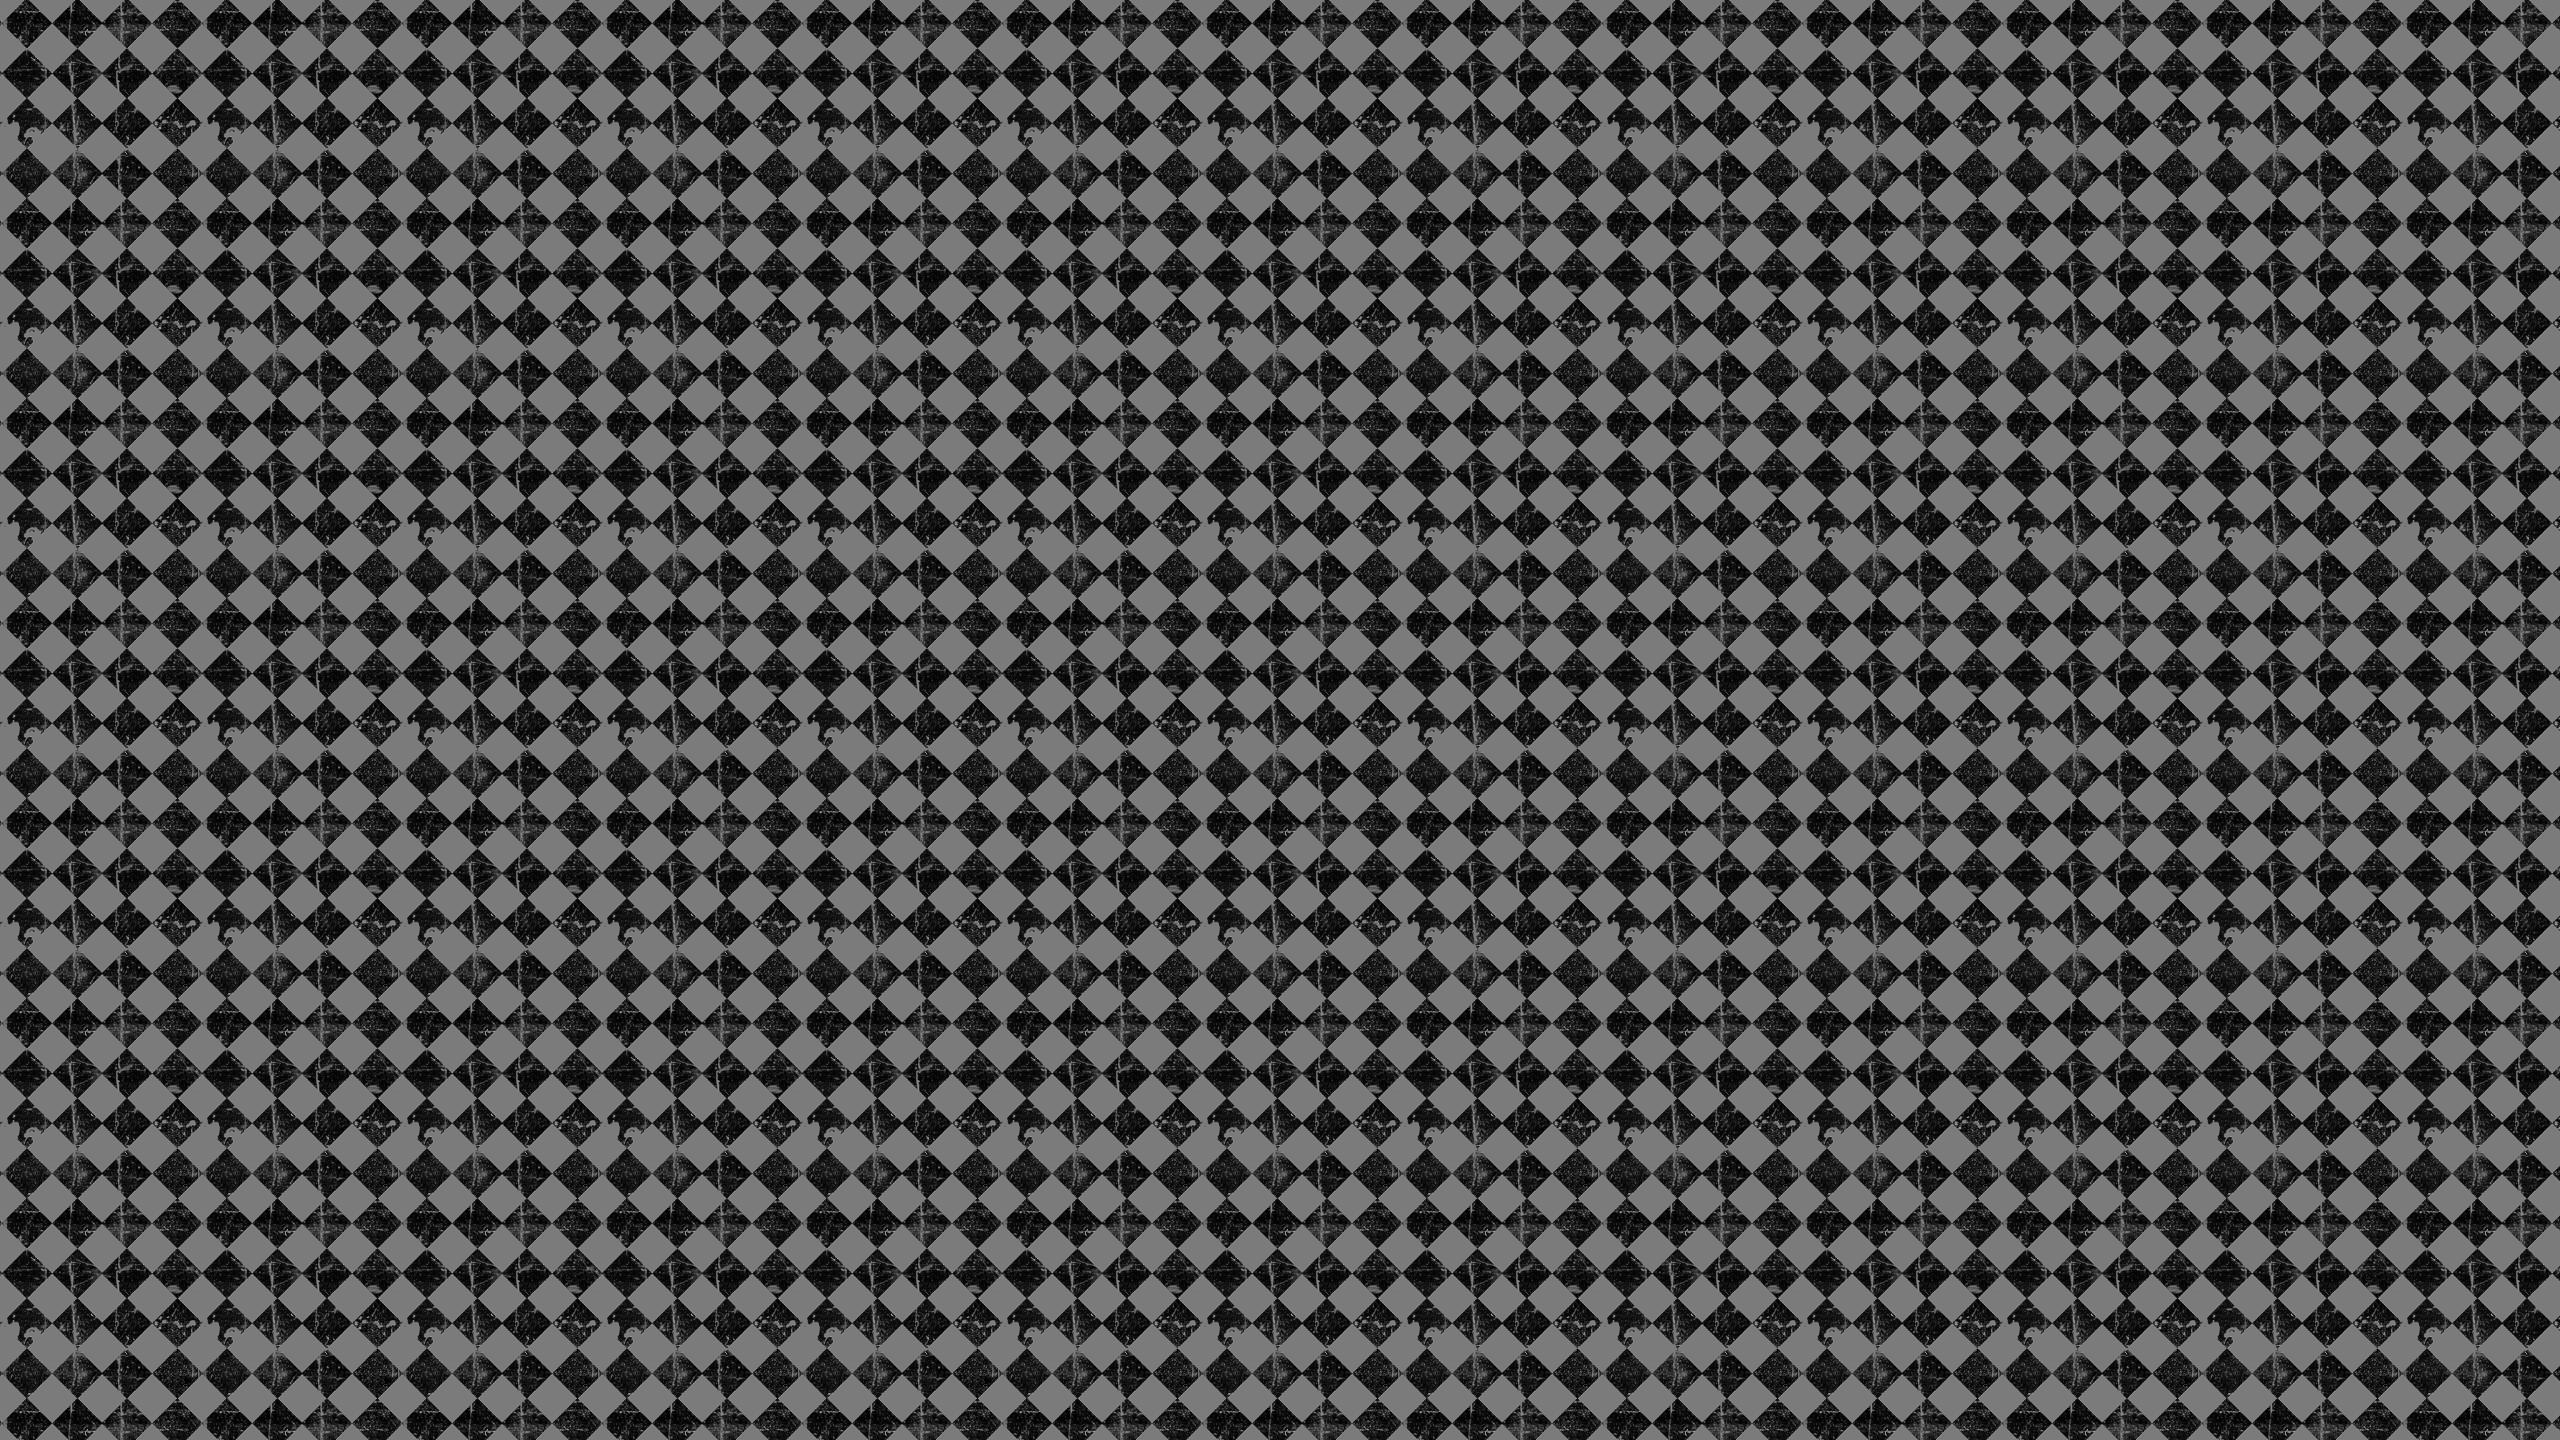 1080x1920 Lockscreens OBlack OReblog Or Like If You Use